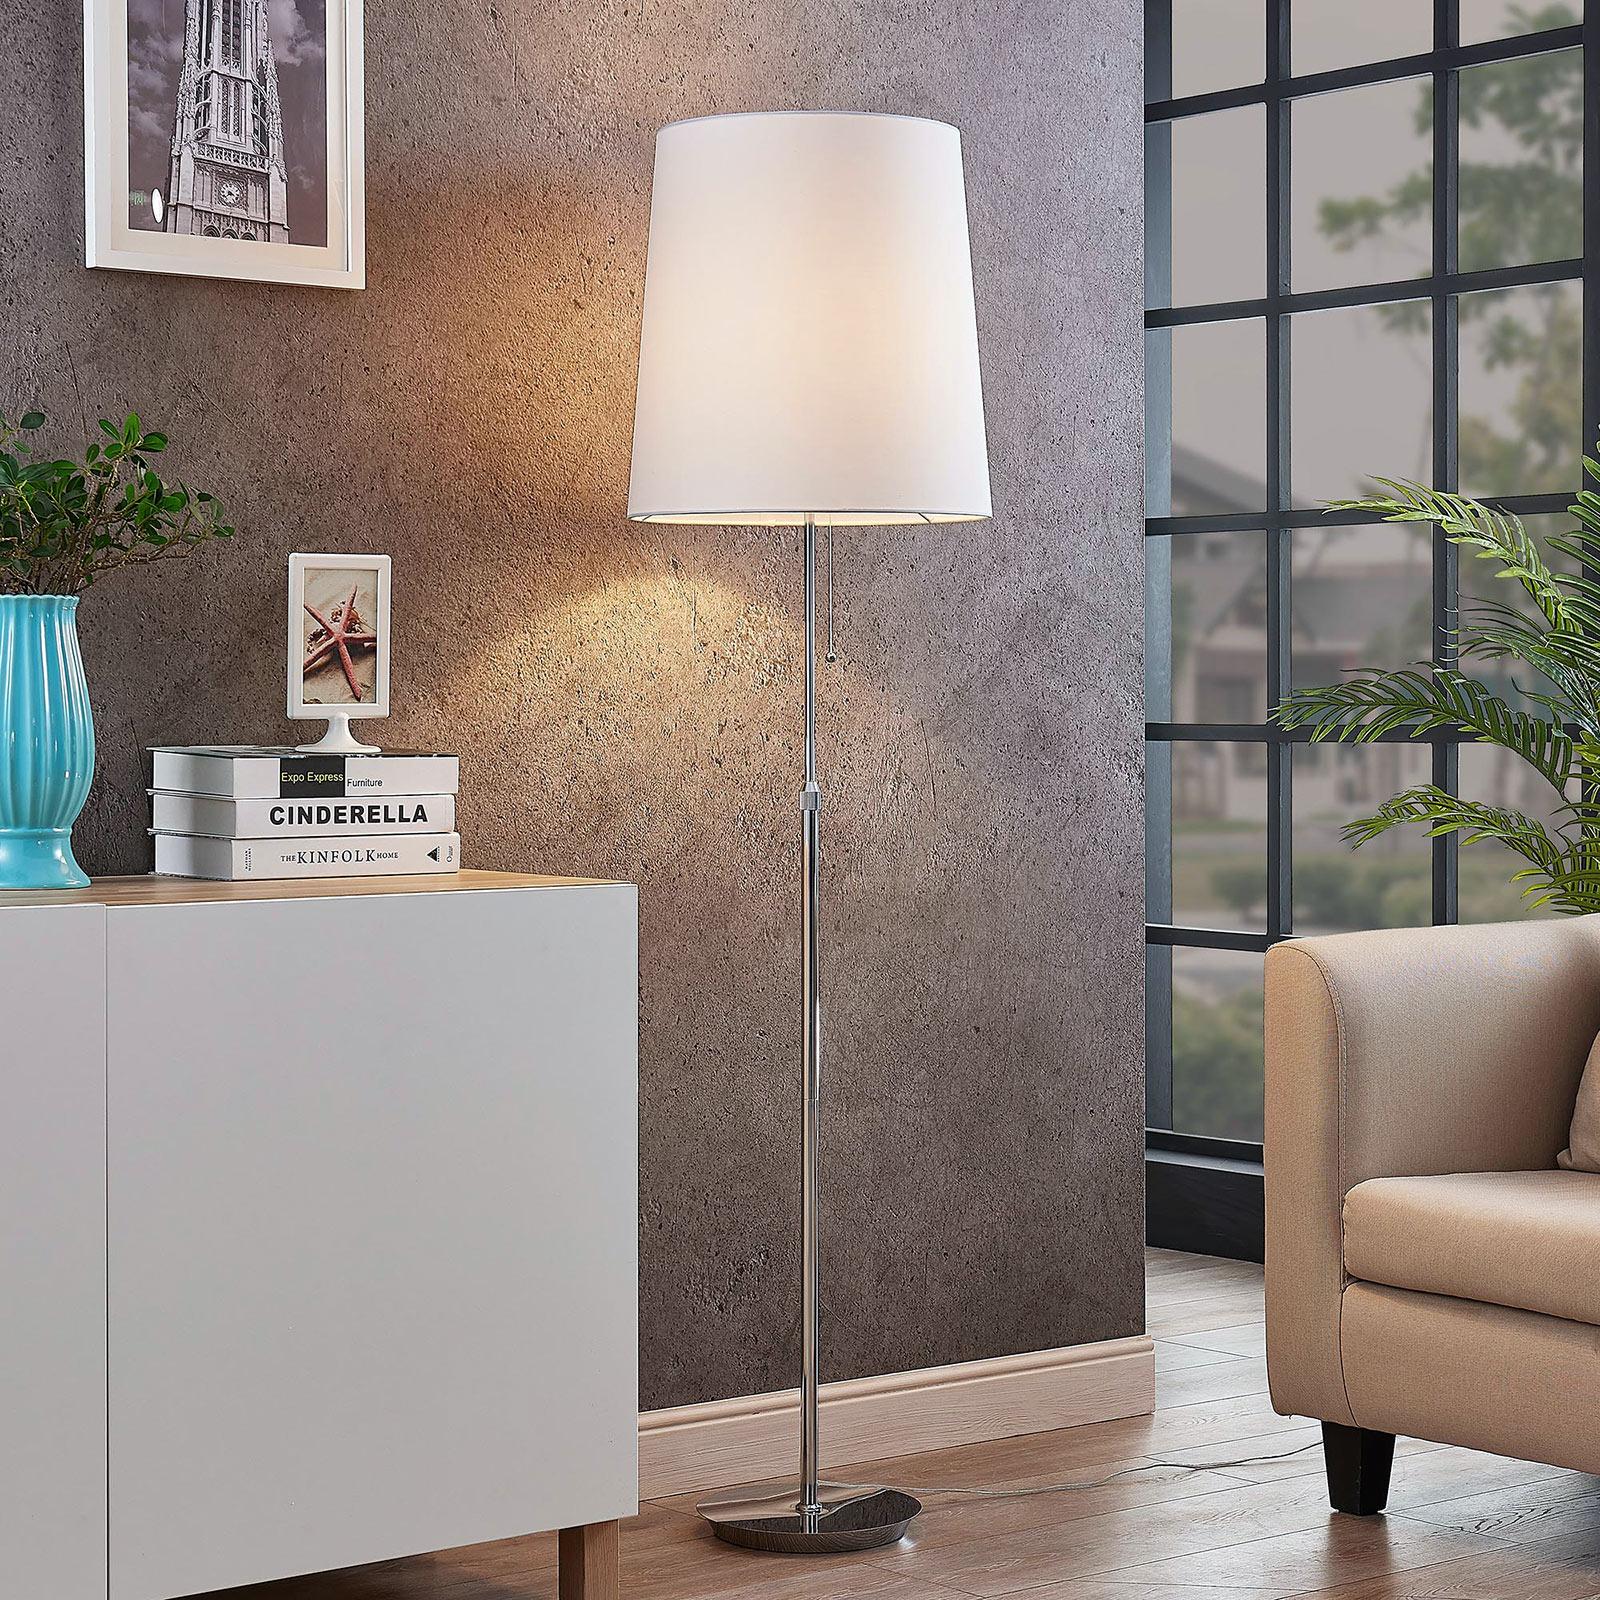 Lucande Pordis vloerlamp, 155 cm, chroom-wit